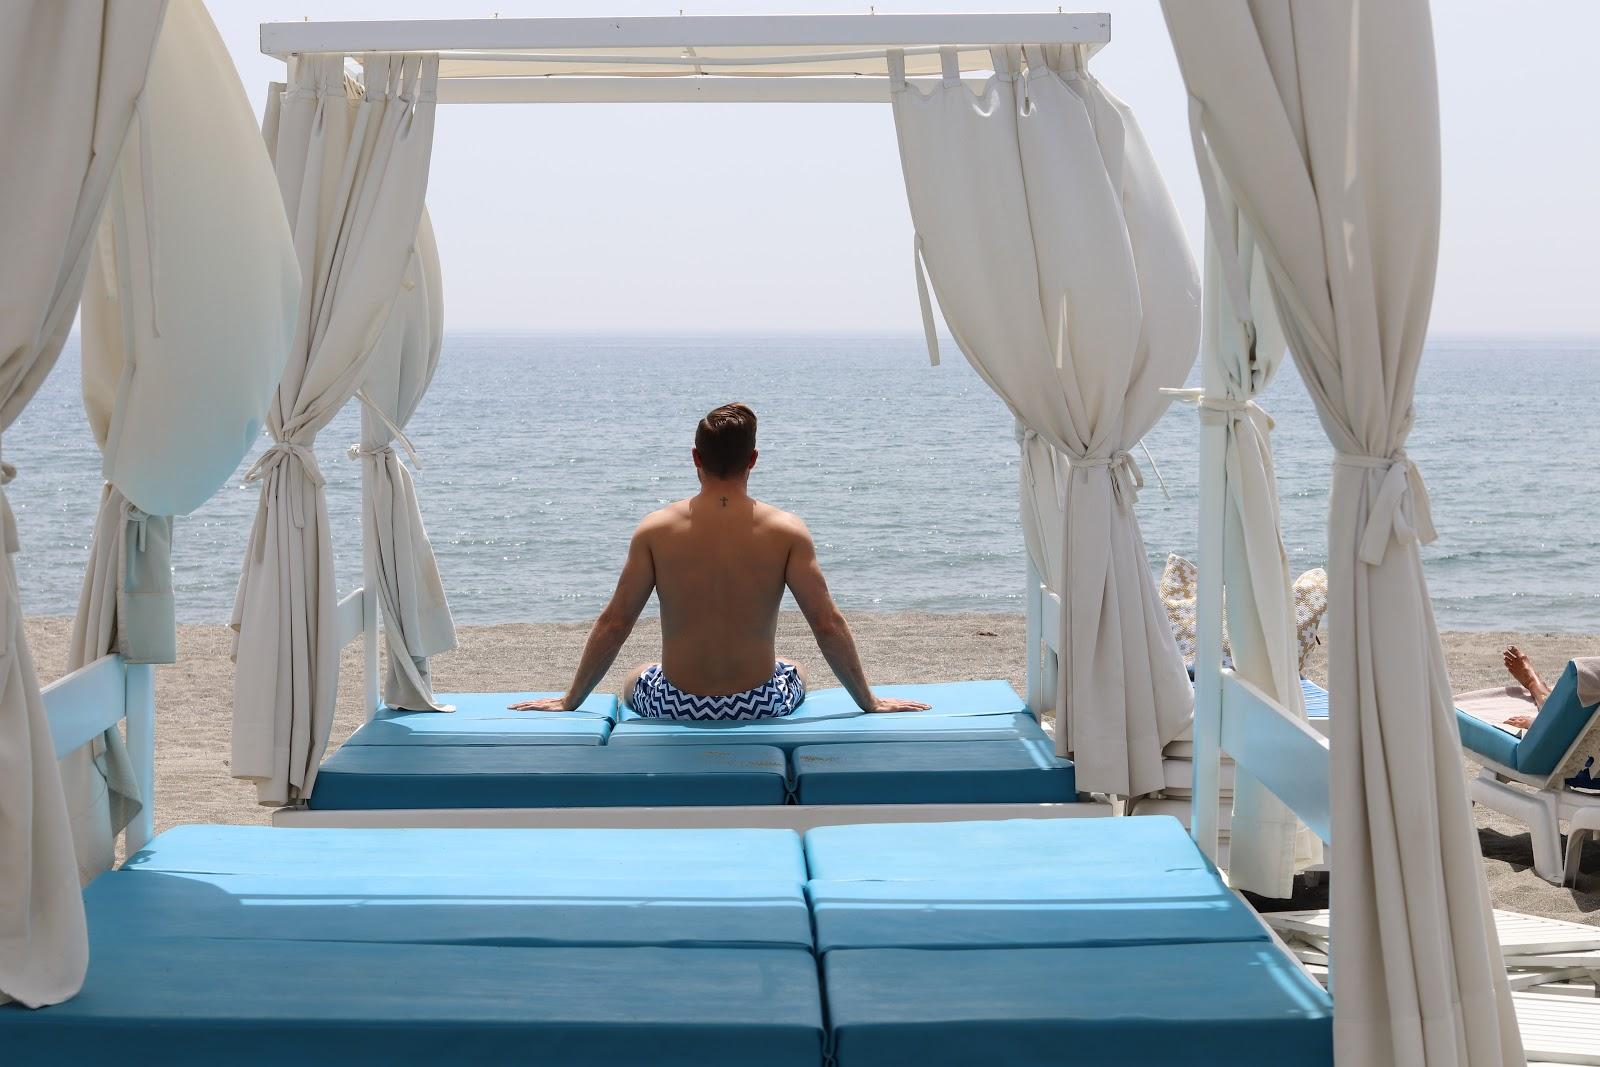 TwentyFirstCenturyGent, Ben Heath sunbathing with a cocktail on a White Day Bed at Chambao Beach Bar, Sotogrande, Spain